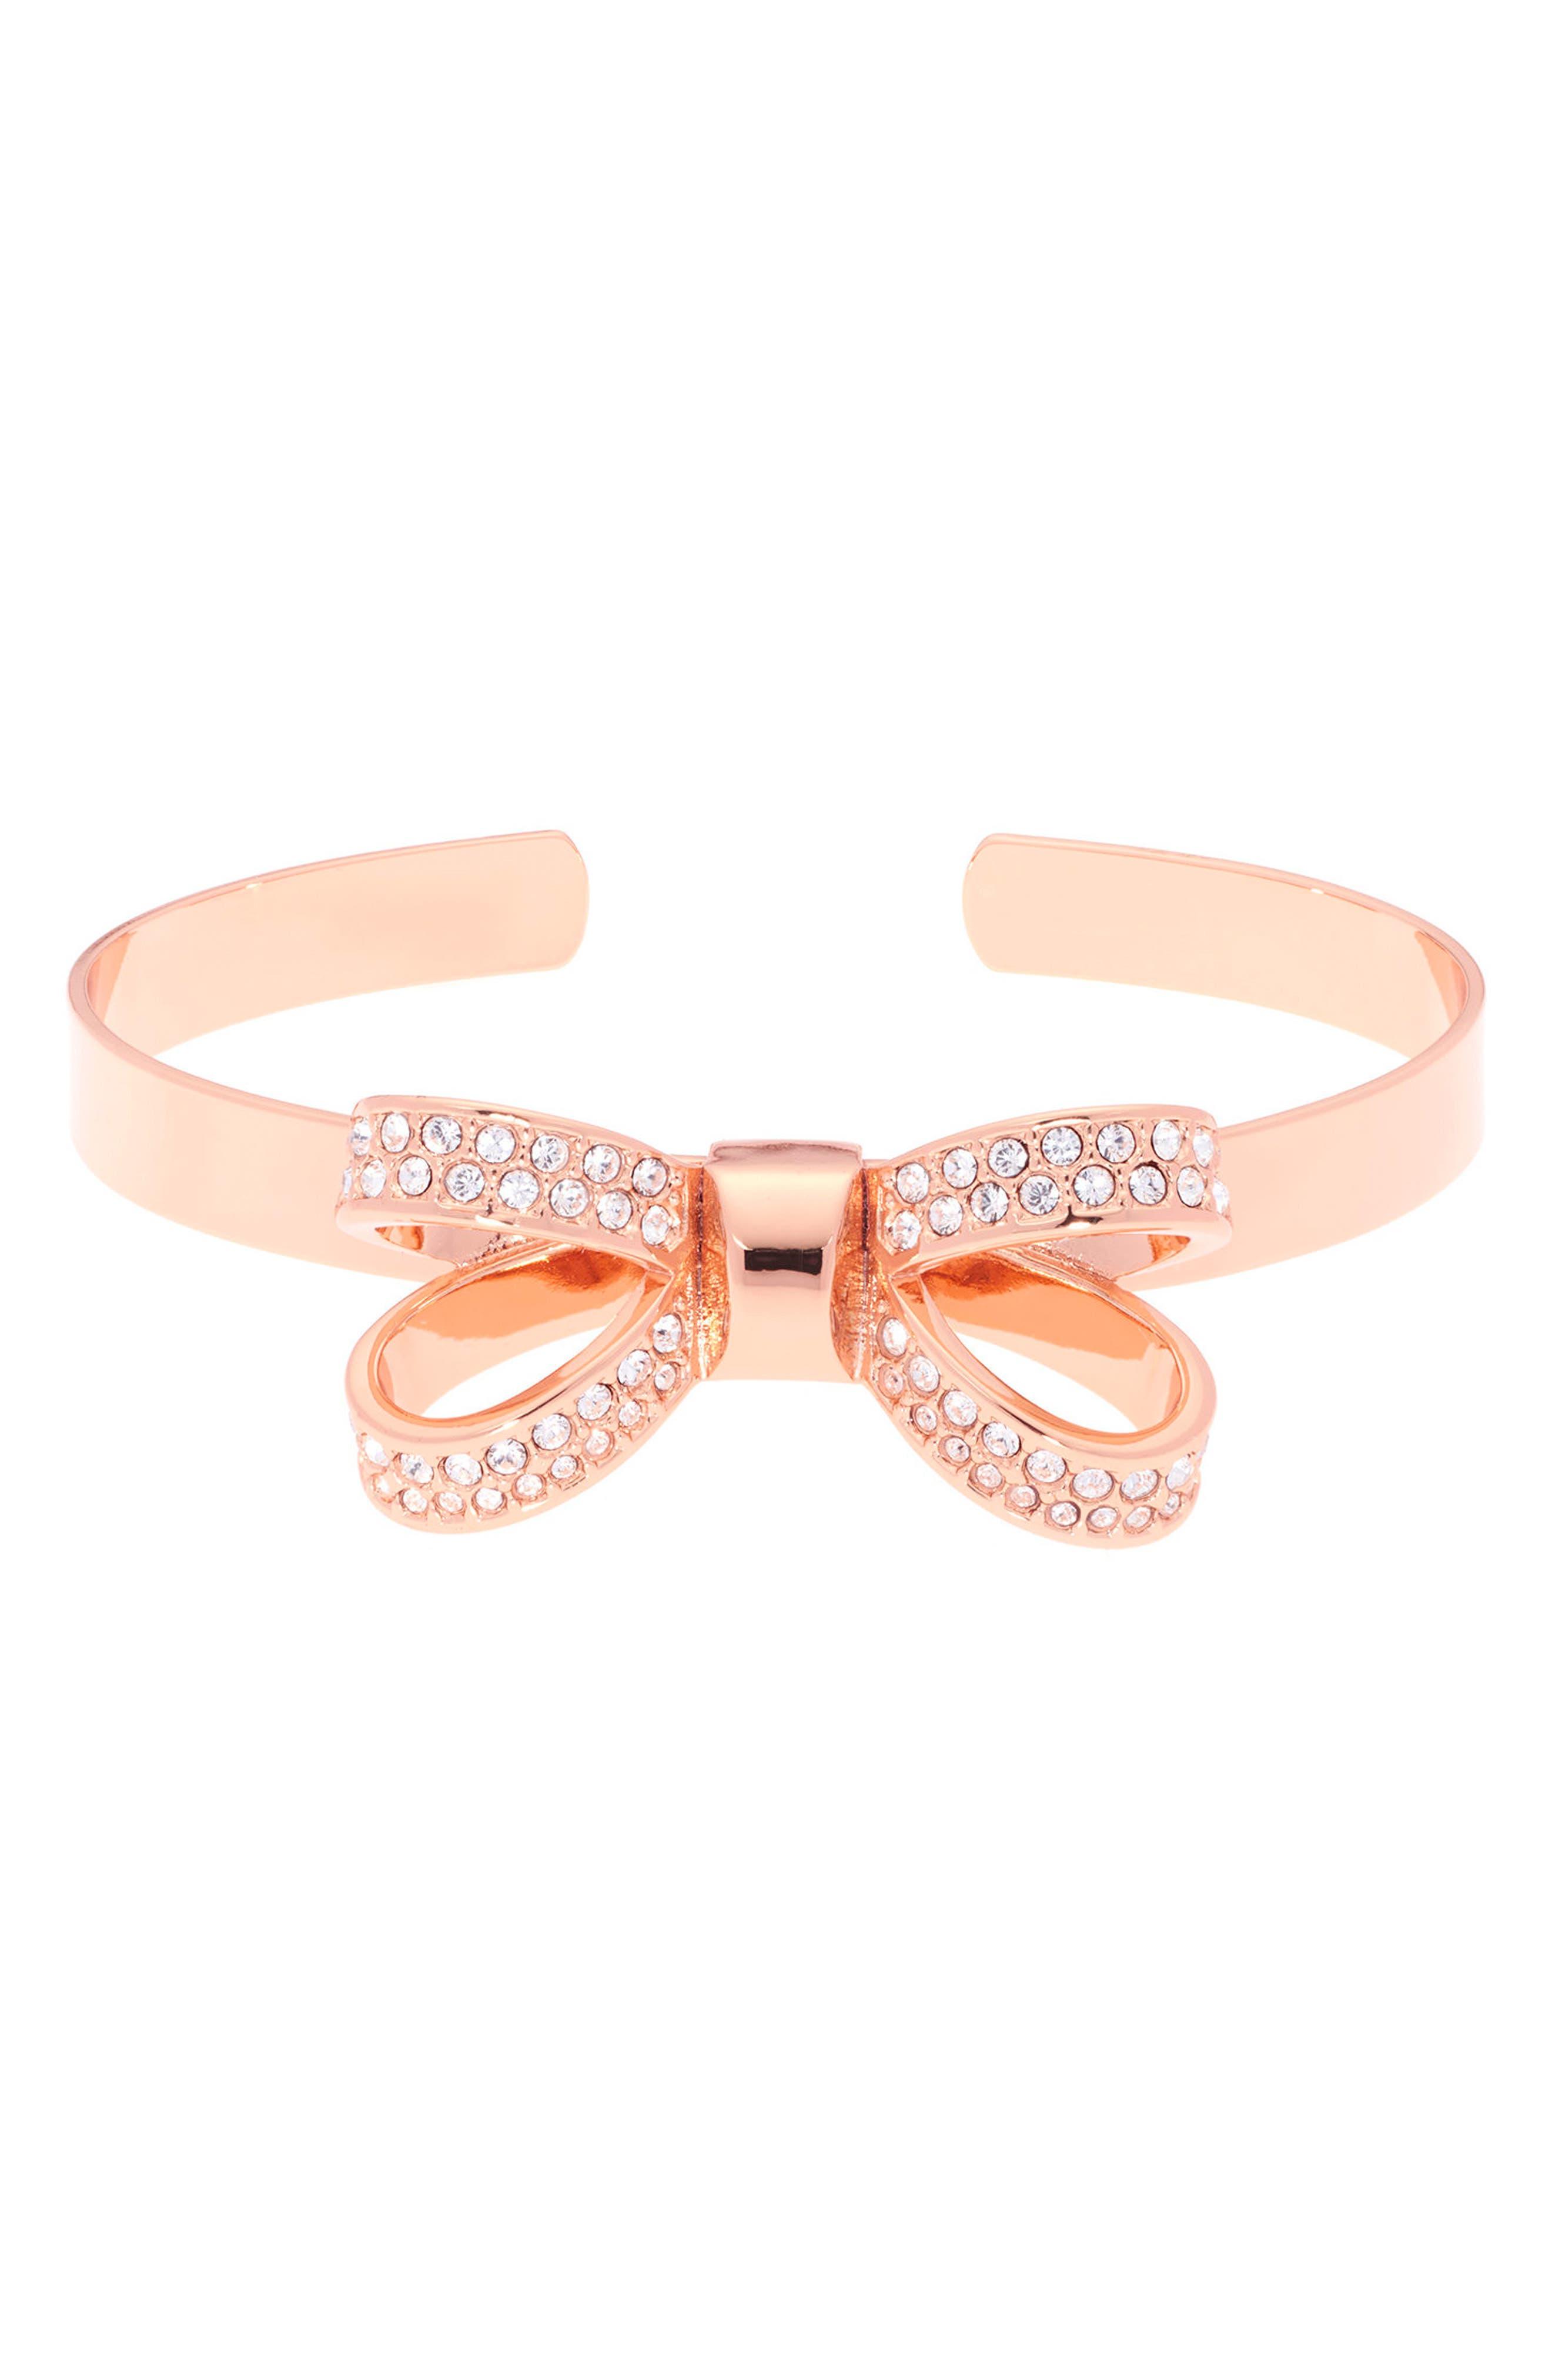 Main Image - Ted Baker London Opulent Pavé Bow Cuff Bracelet